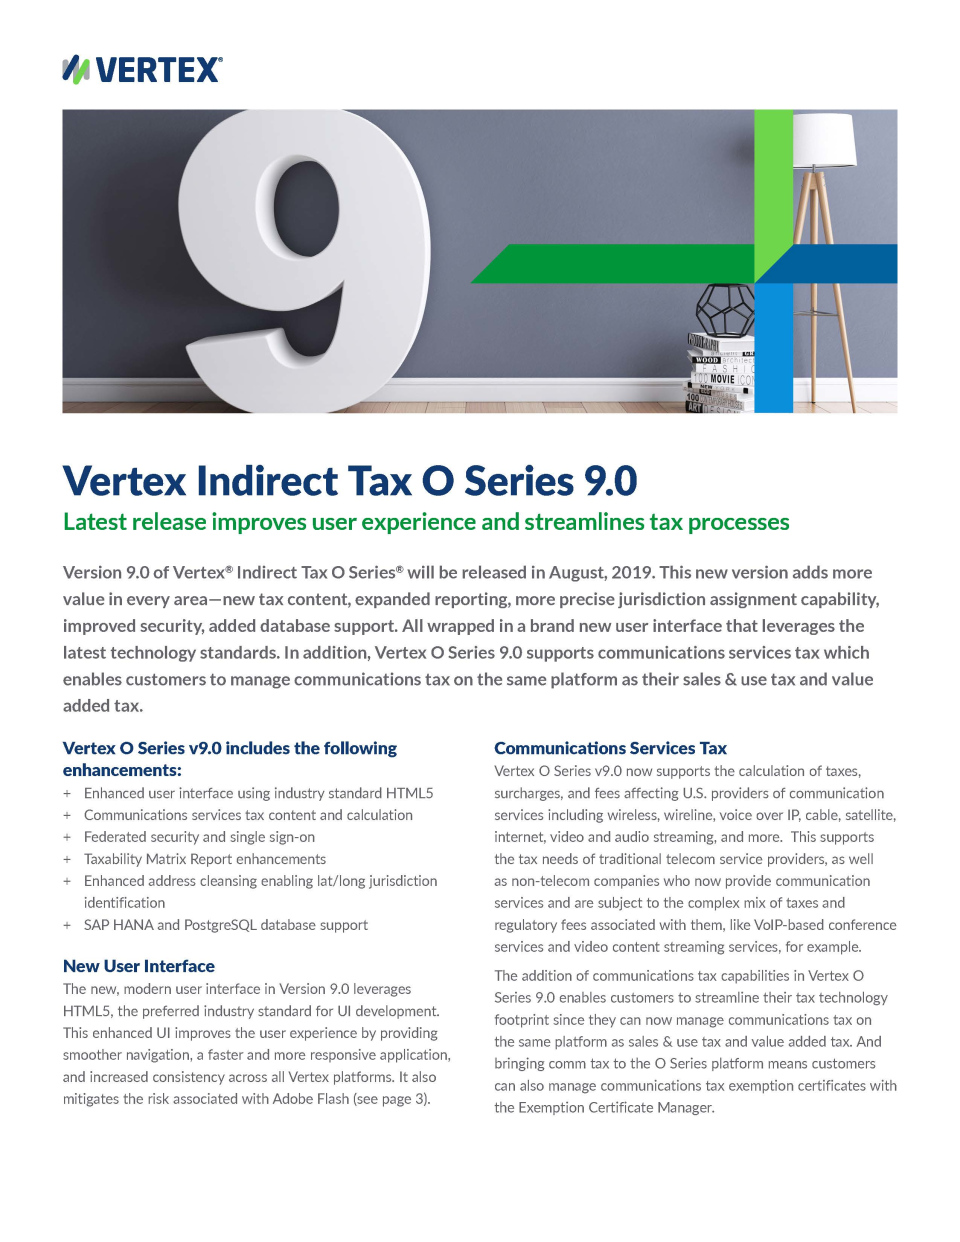 Vertex O Series Reviews and Pricing - 2019